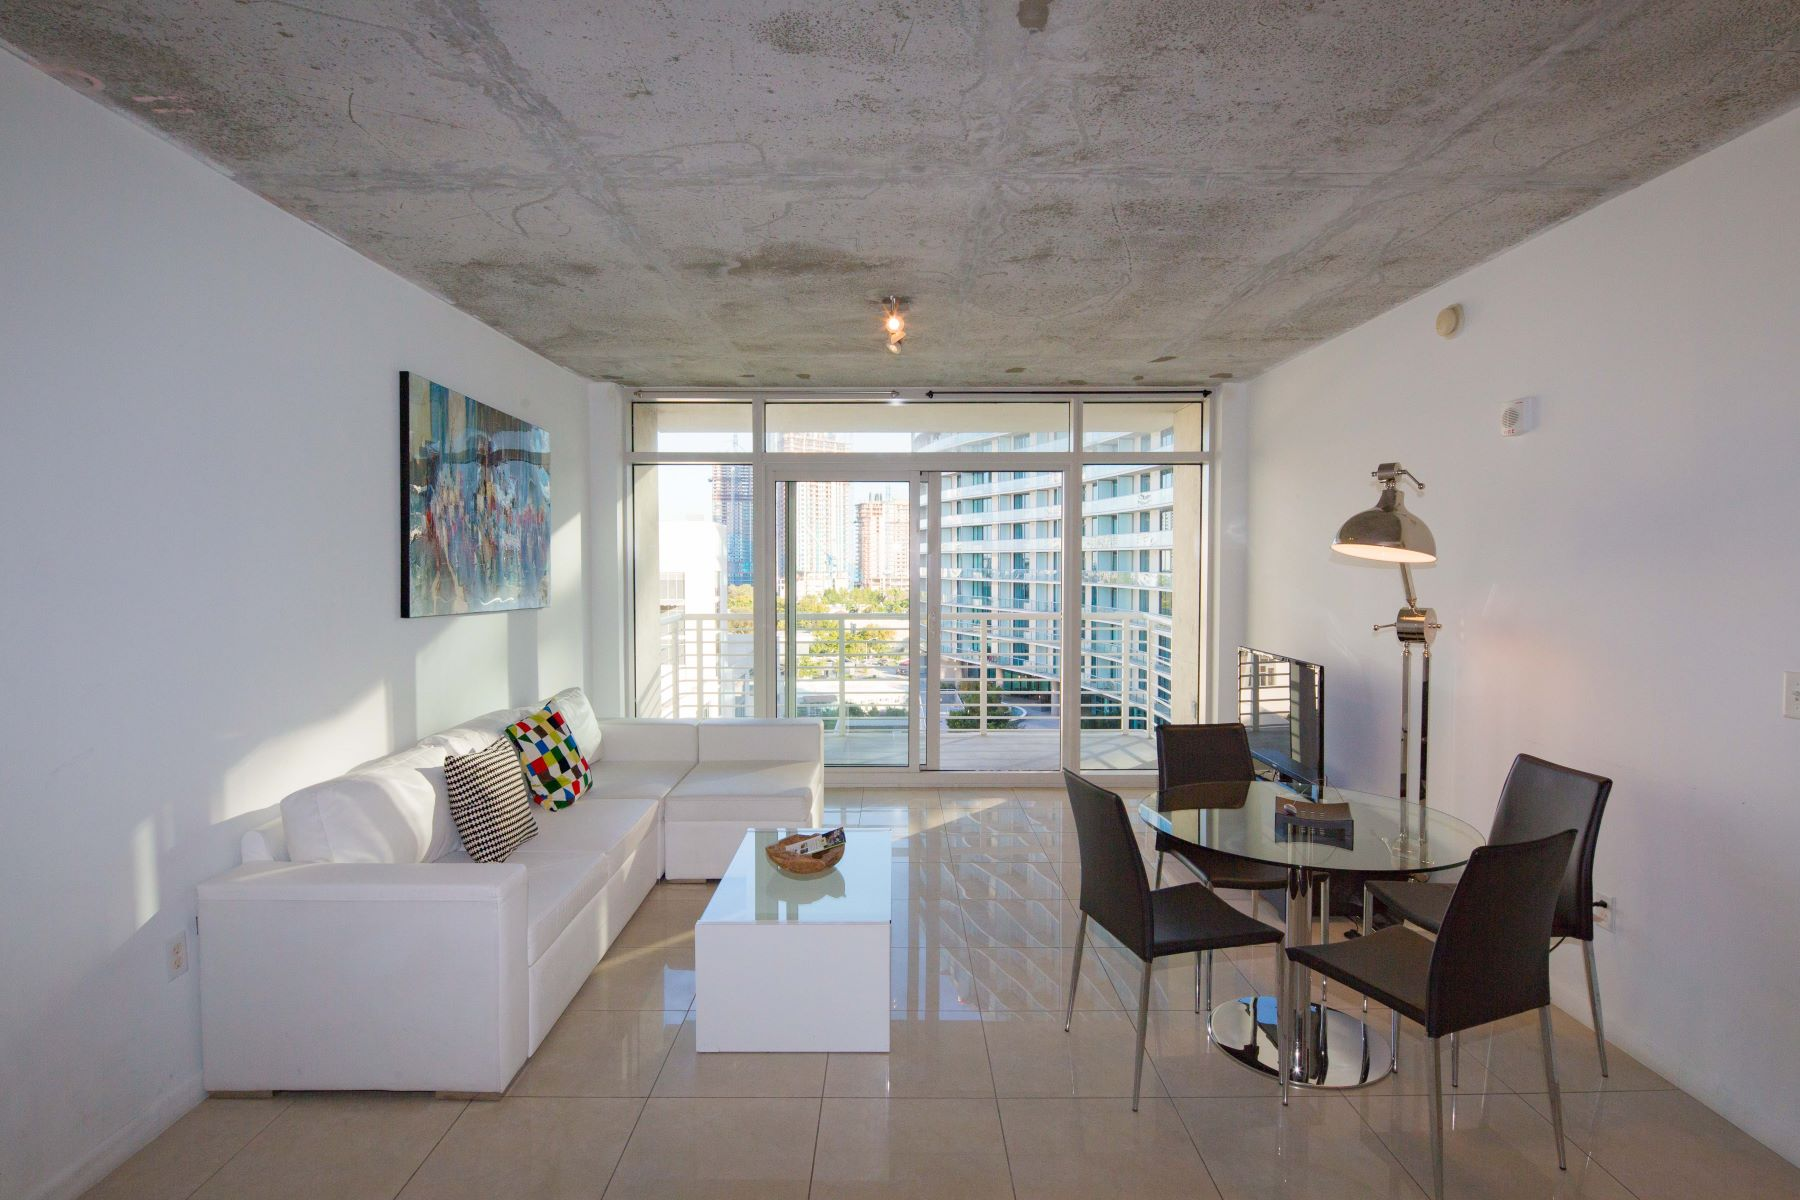 Condominium for Sale at 3250 Ne 1st Ave #920 3250 Ne 1st Ave 920 Miami, Florida, 33137 United States